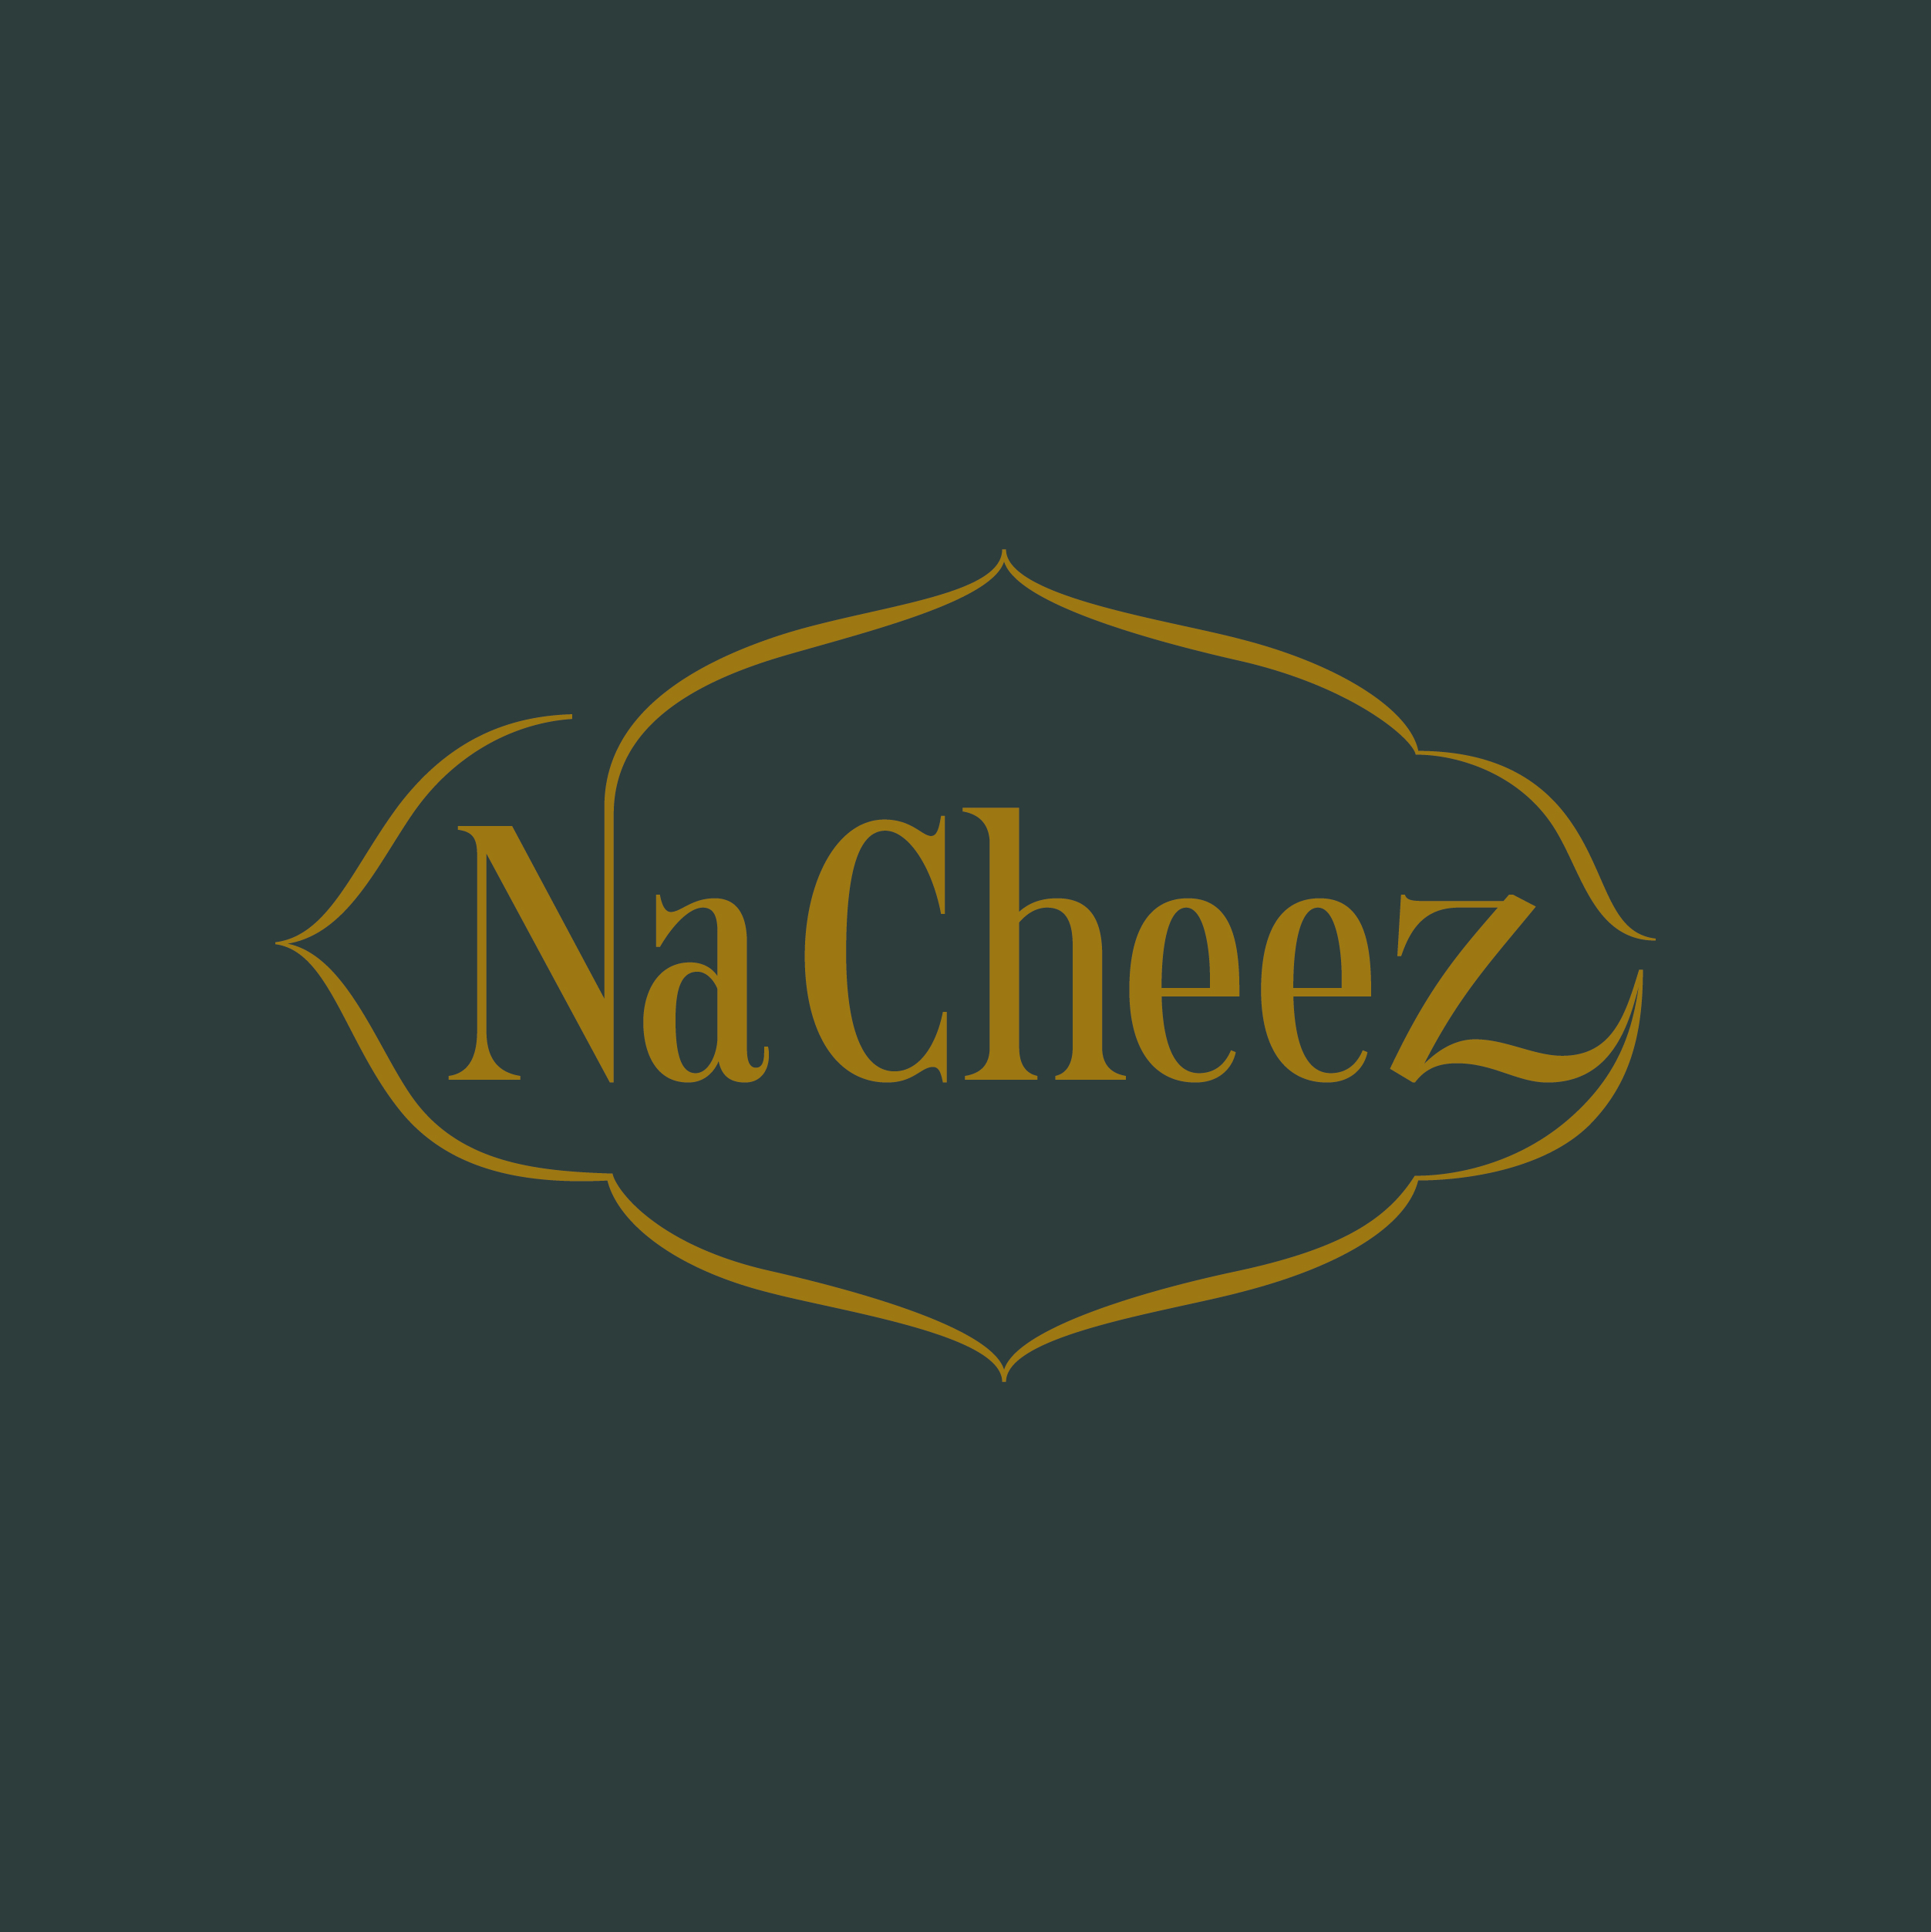 NaCheezLogoFin_F-01